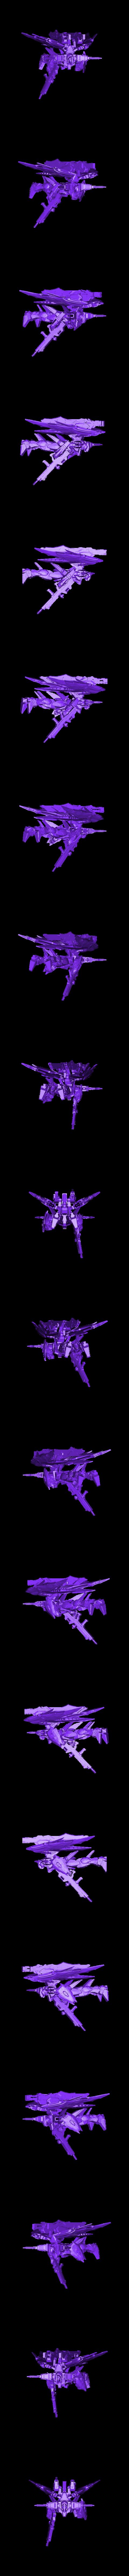 Metal%2BBuild%2BDestiny_2__merged_cut_2_cut_2_cut_2_Rescaled0.010.stl Télécharger fichier STL gratuit Gundam : Construction métallique Destiny Gundam • Design à imprimer en 3D, Peanut3DButter